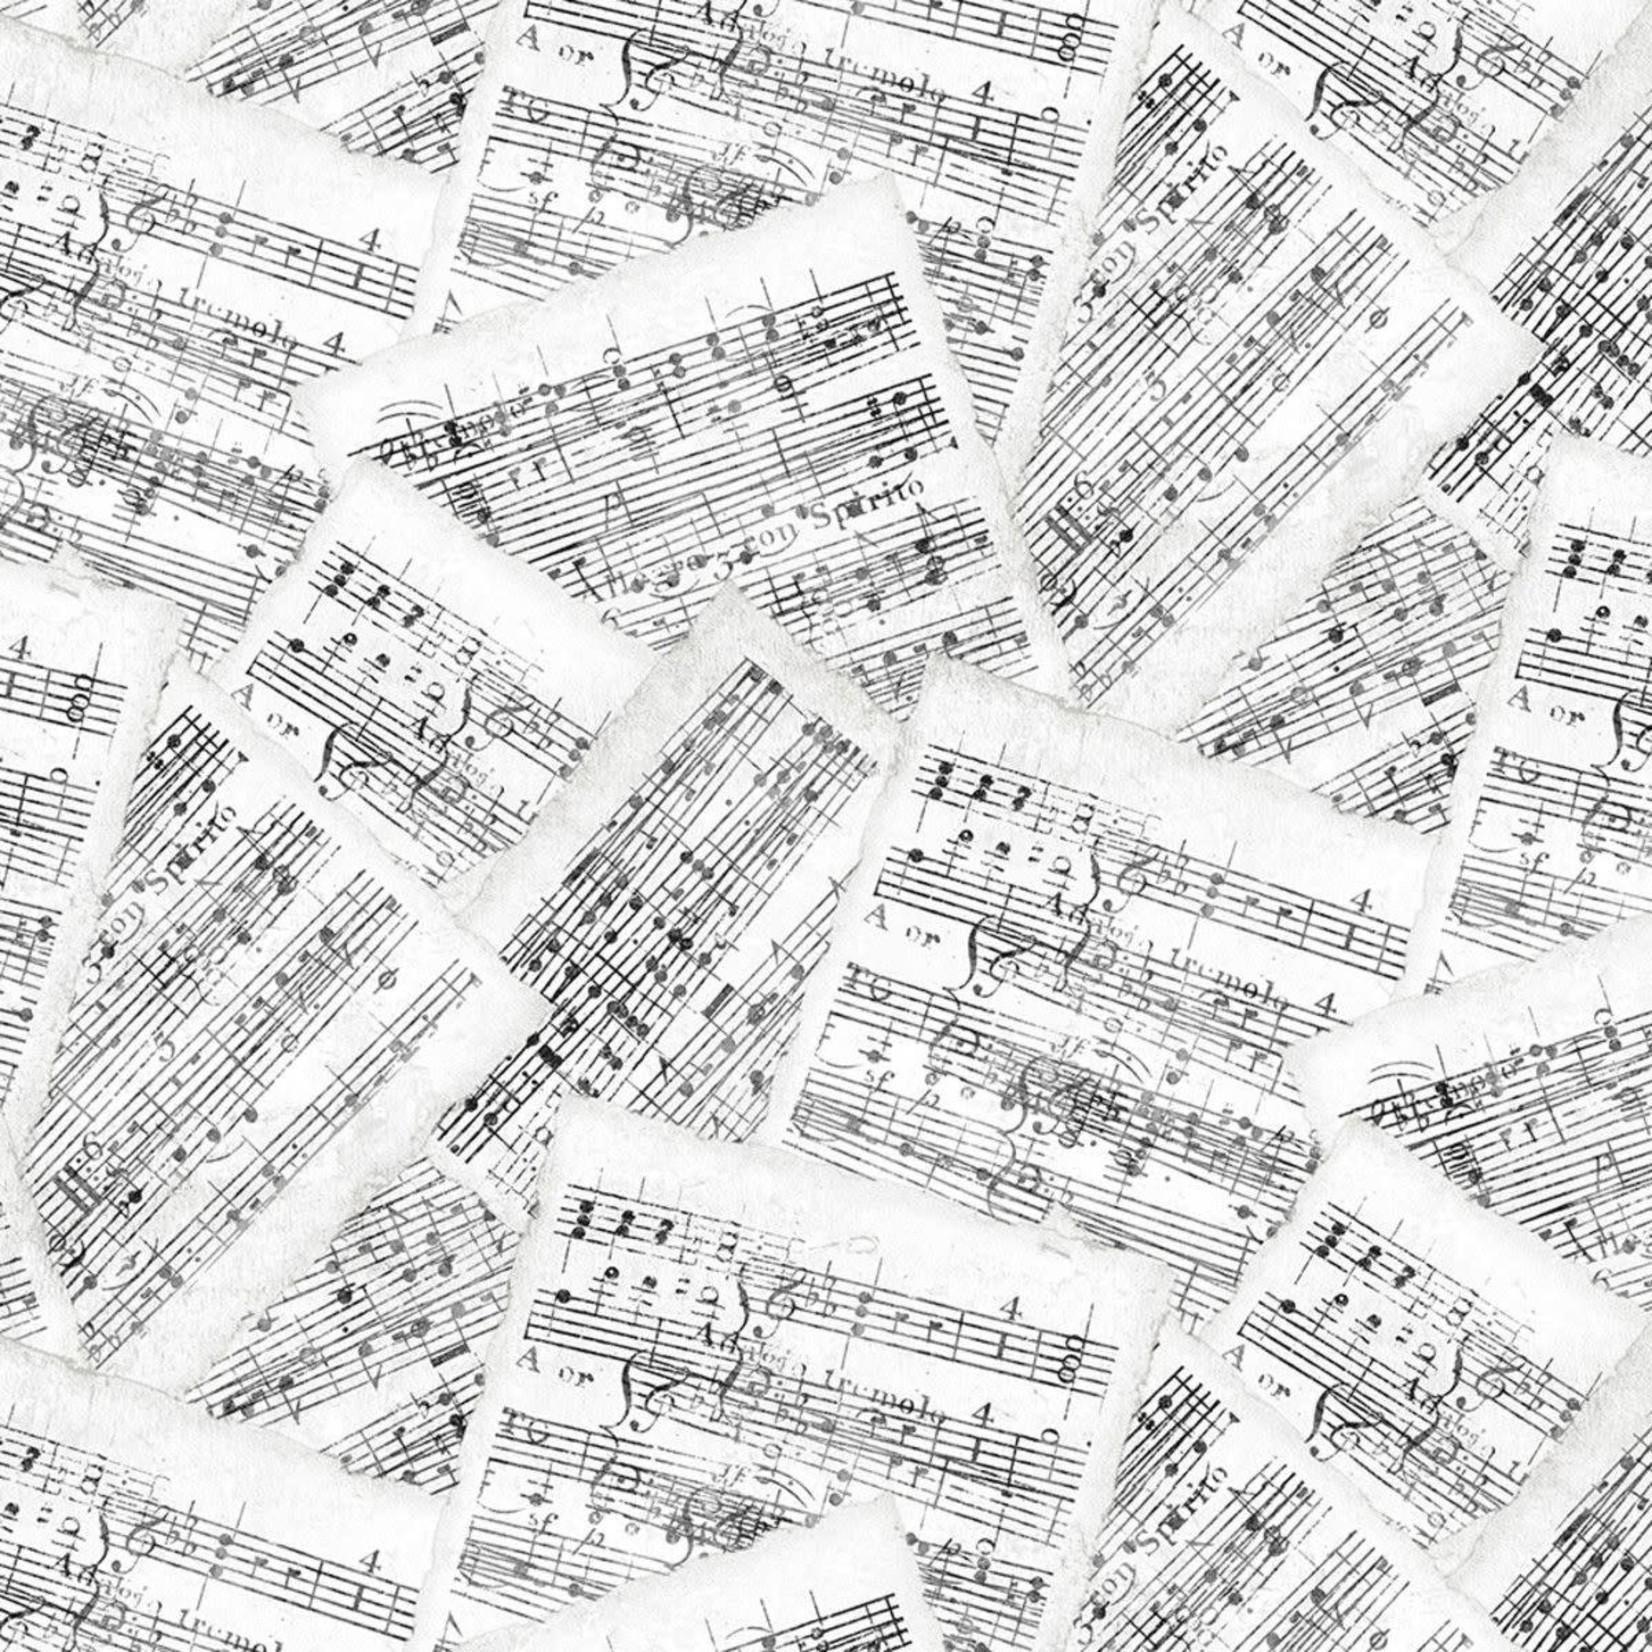 Wilmington Prints Interlude - Sheet Music - White